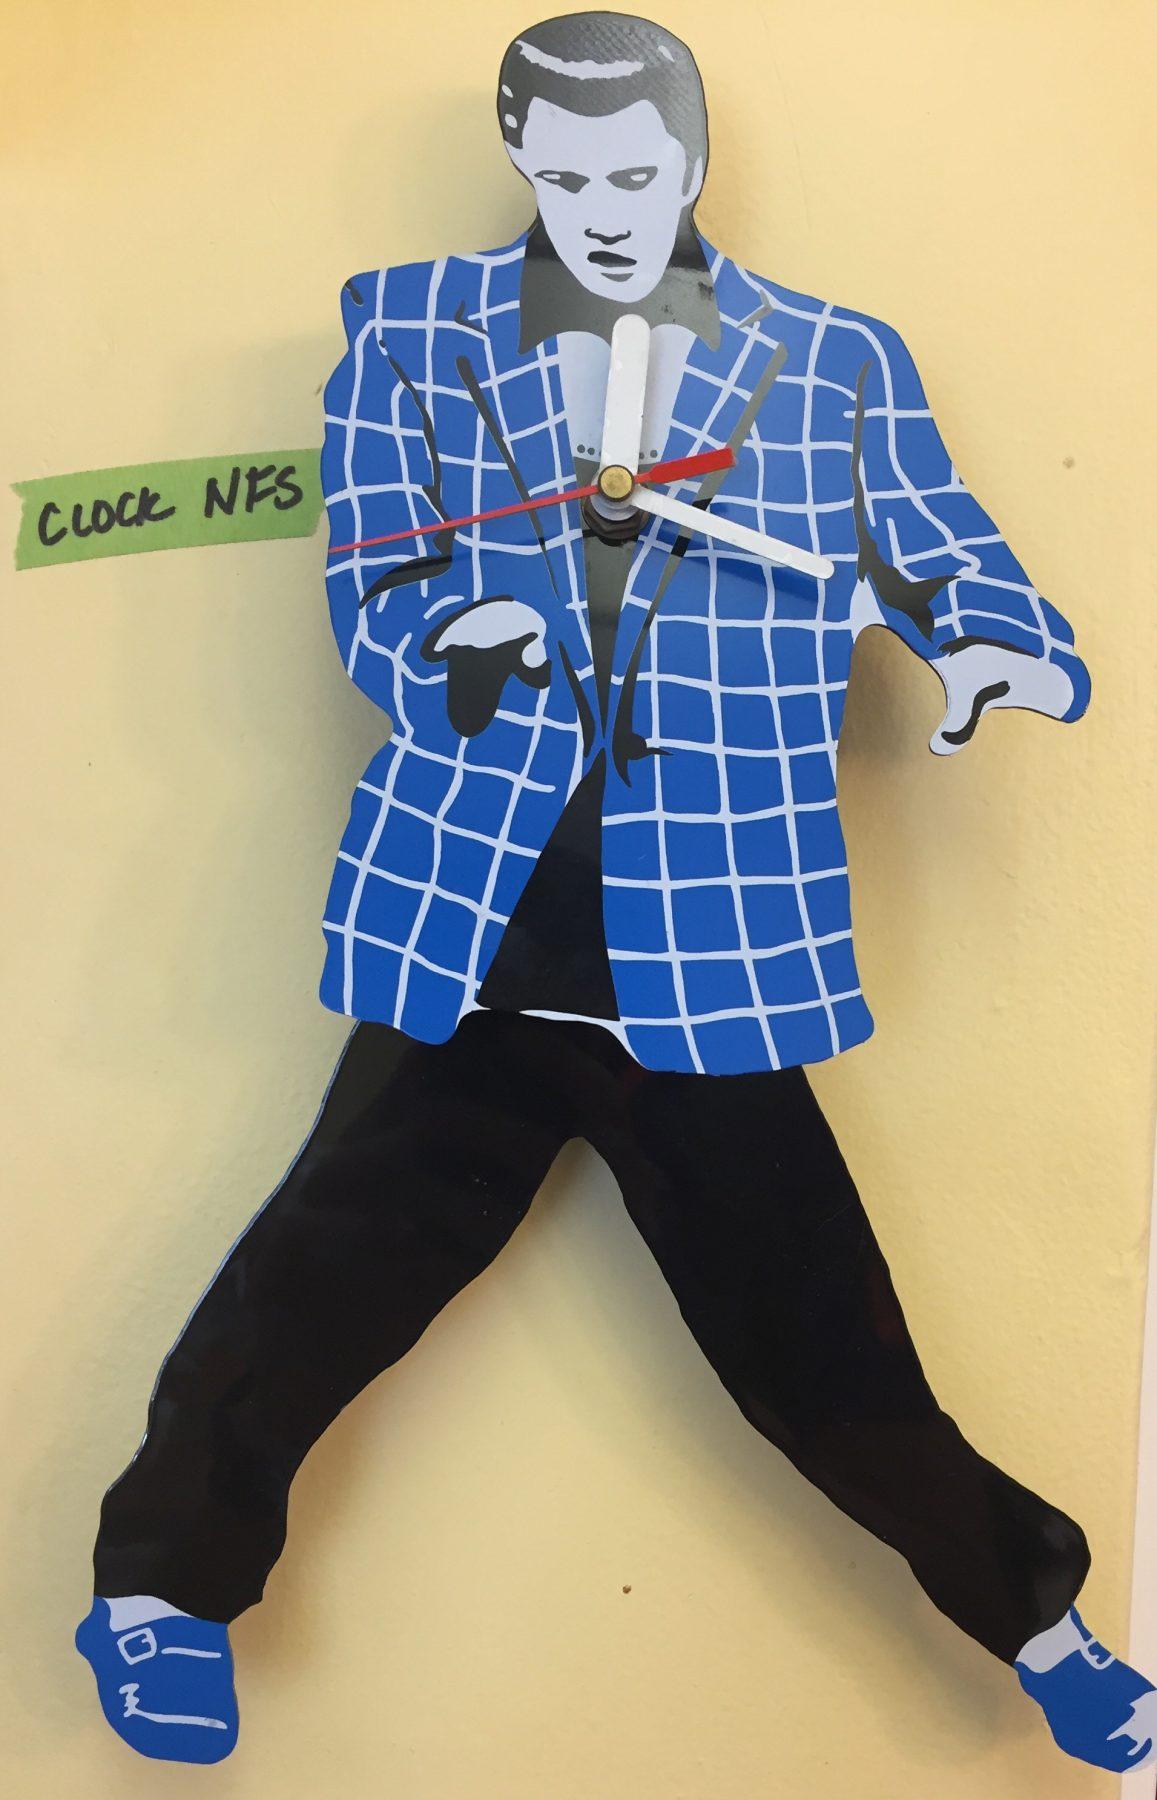 Elvis clock - NBF